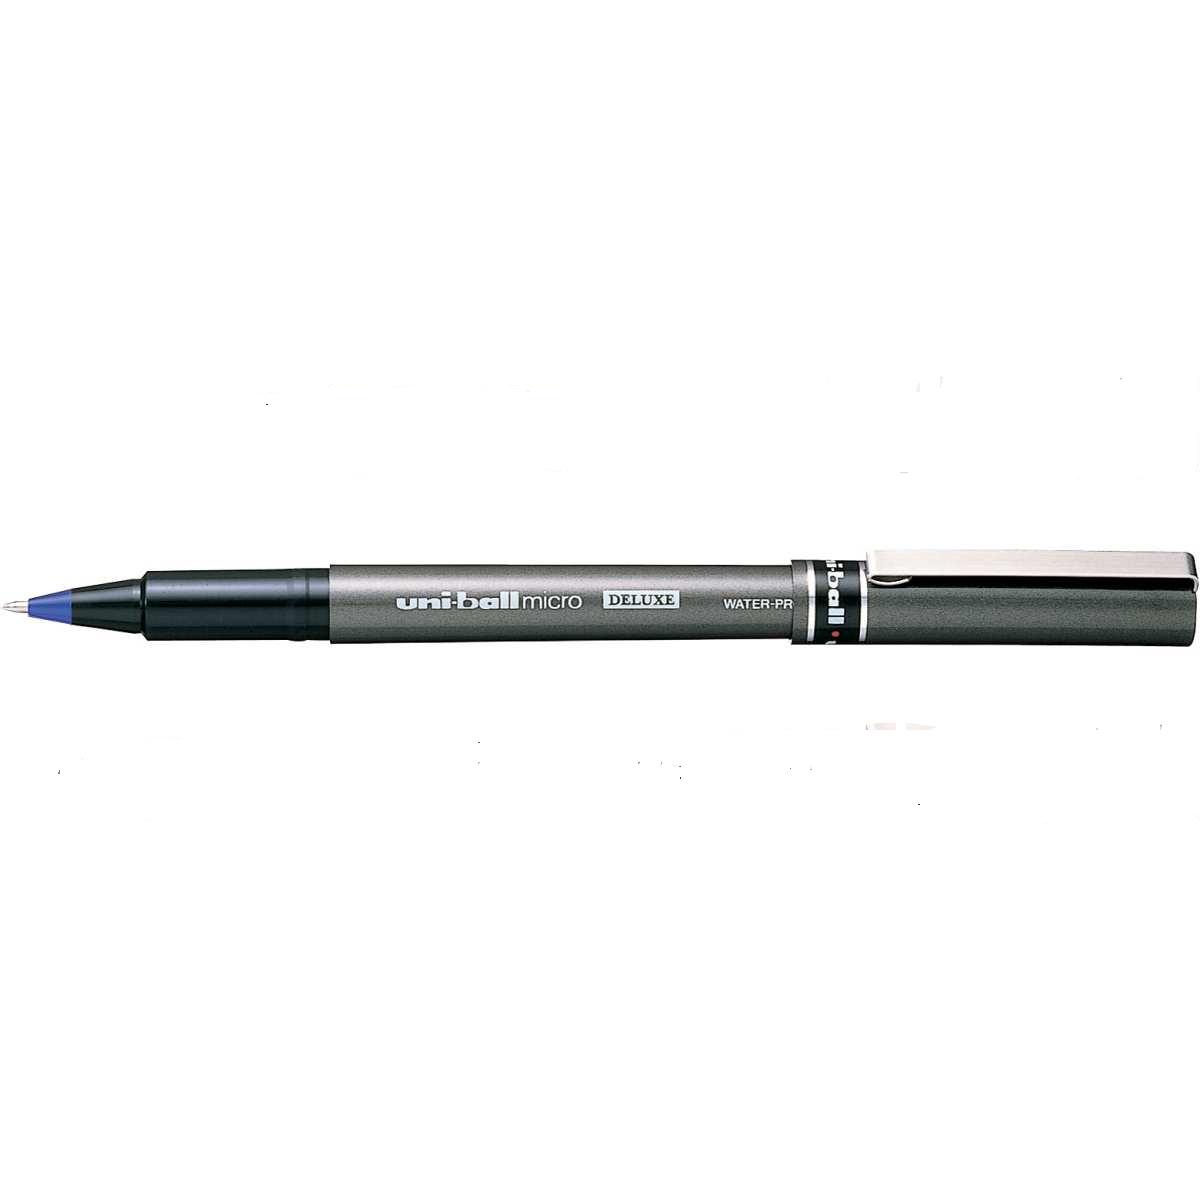 Caneta Hidrográfica Deluxe UB 155 Micro Azul Uni-ball